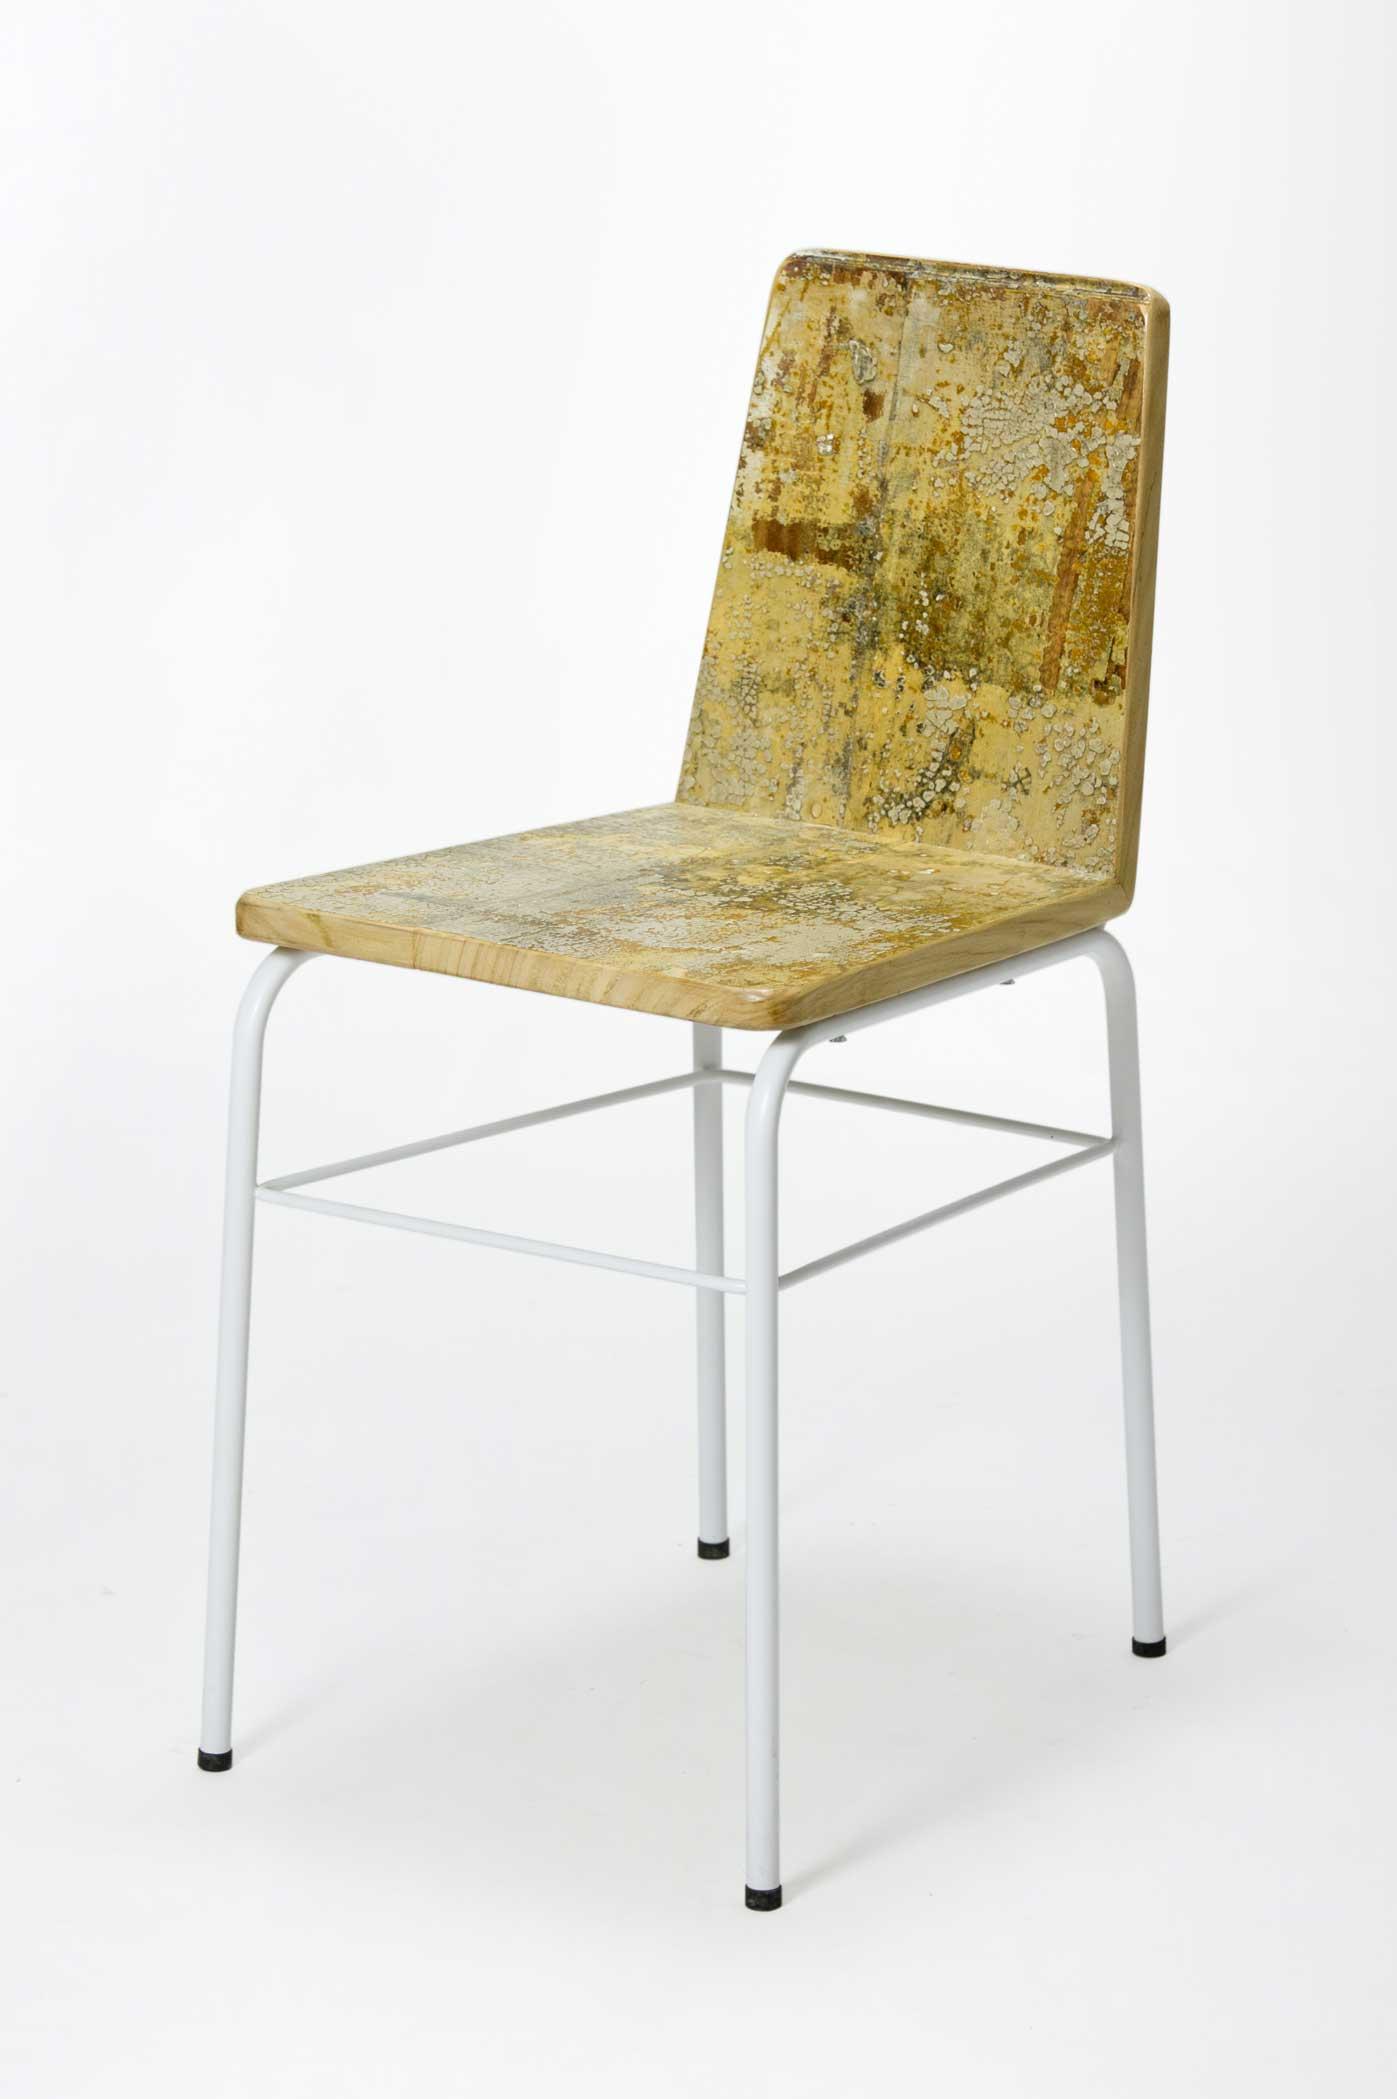 Sedia design vintage in legno